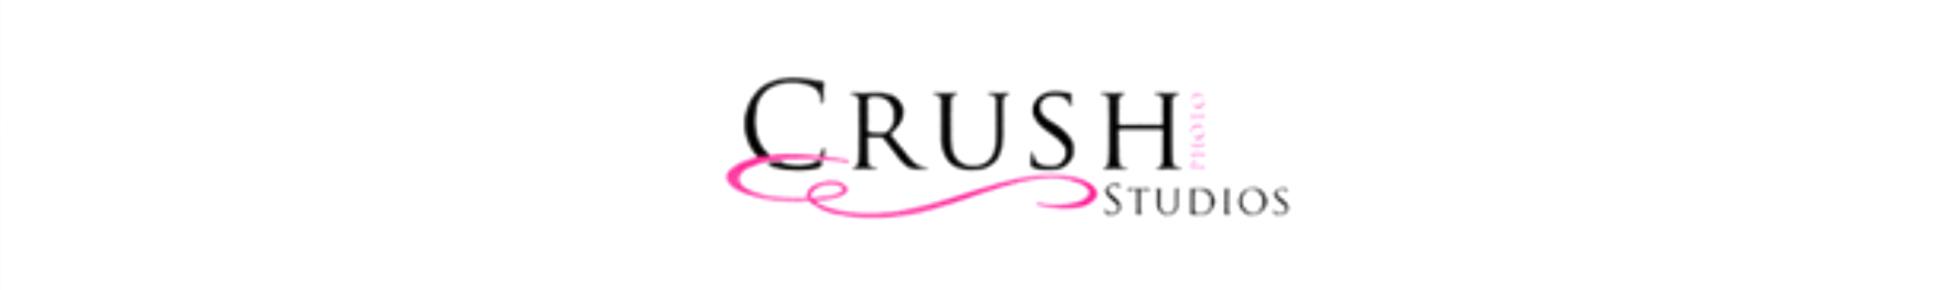 Crush_studios.jpg